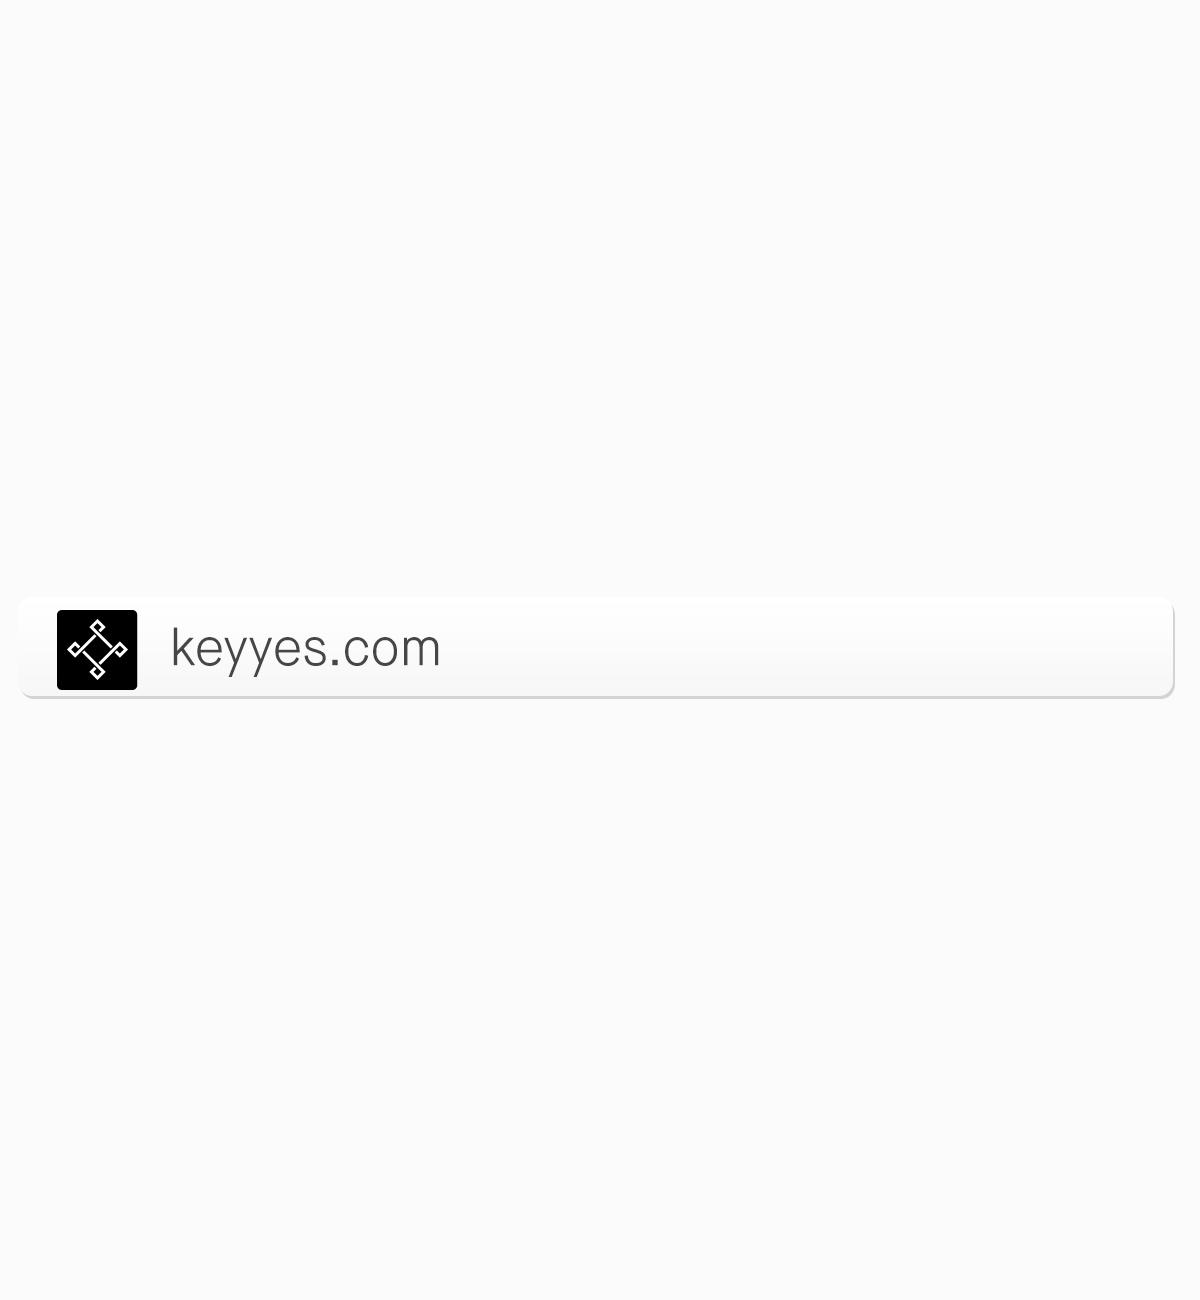 Keyyes